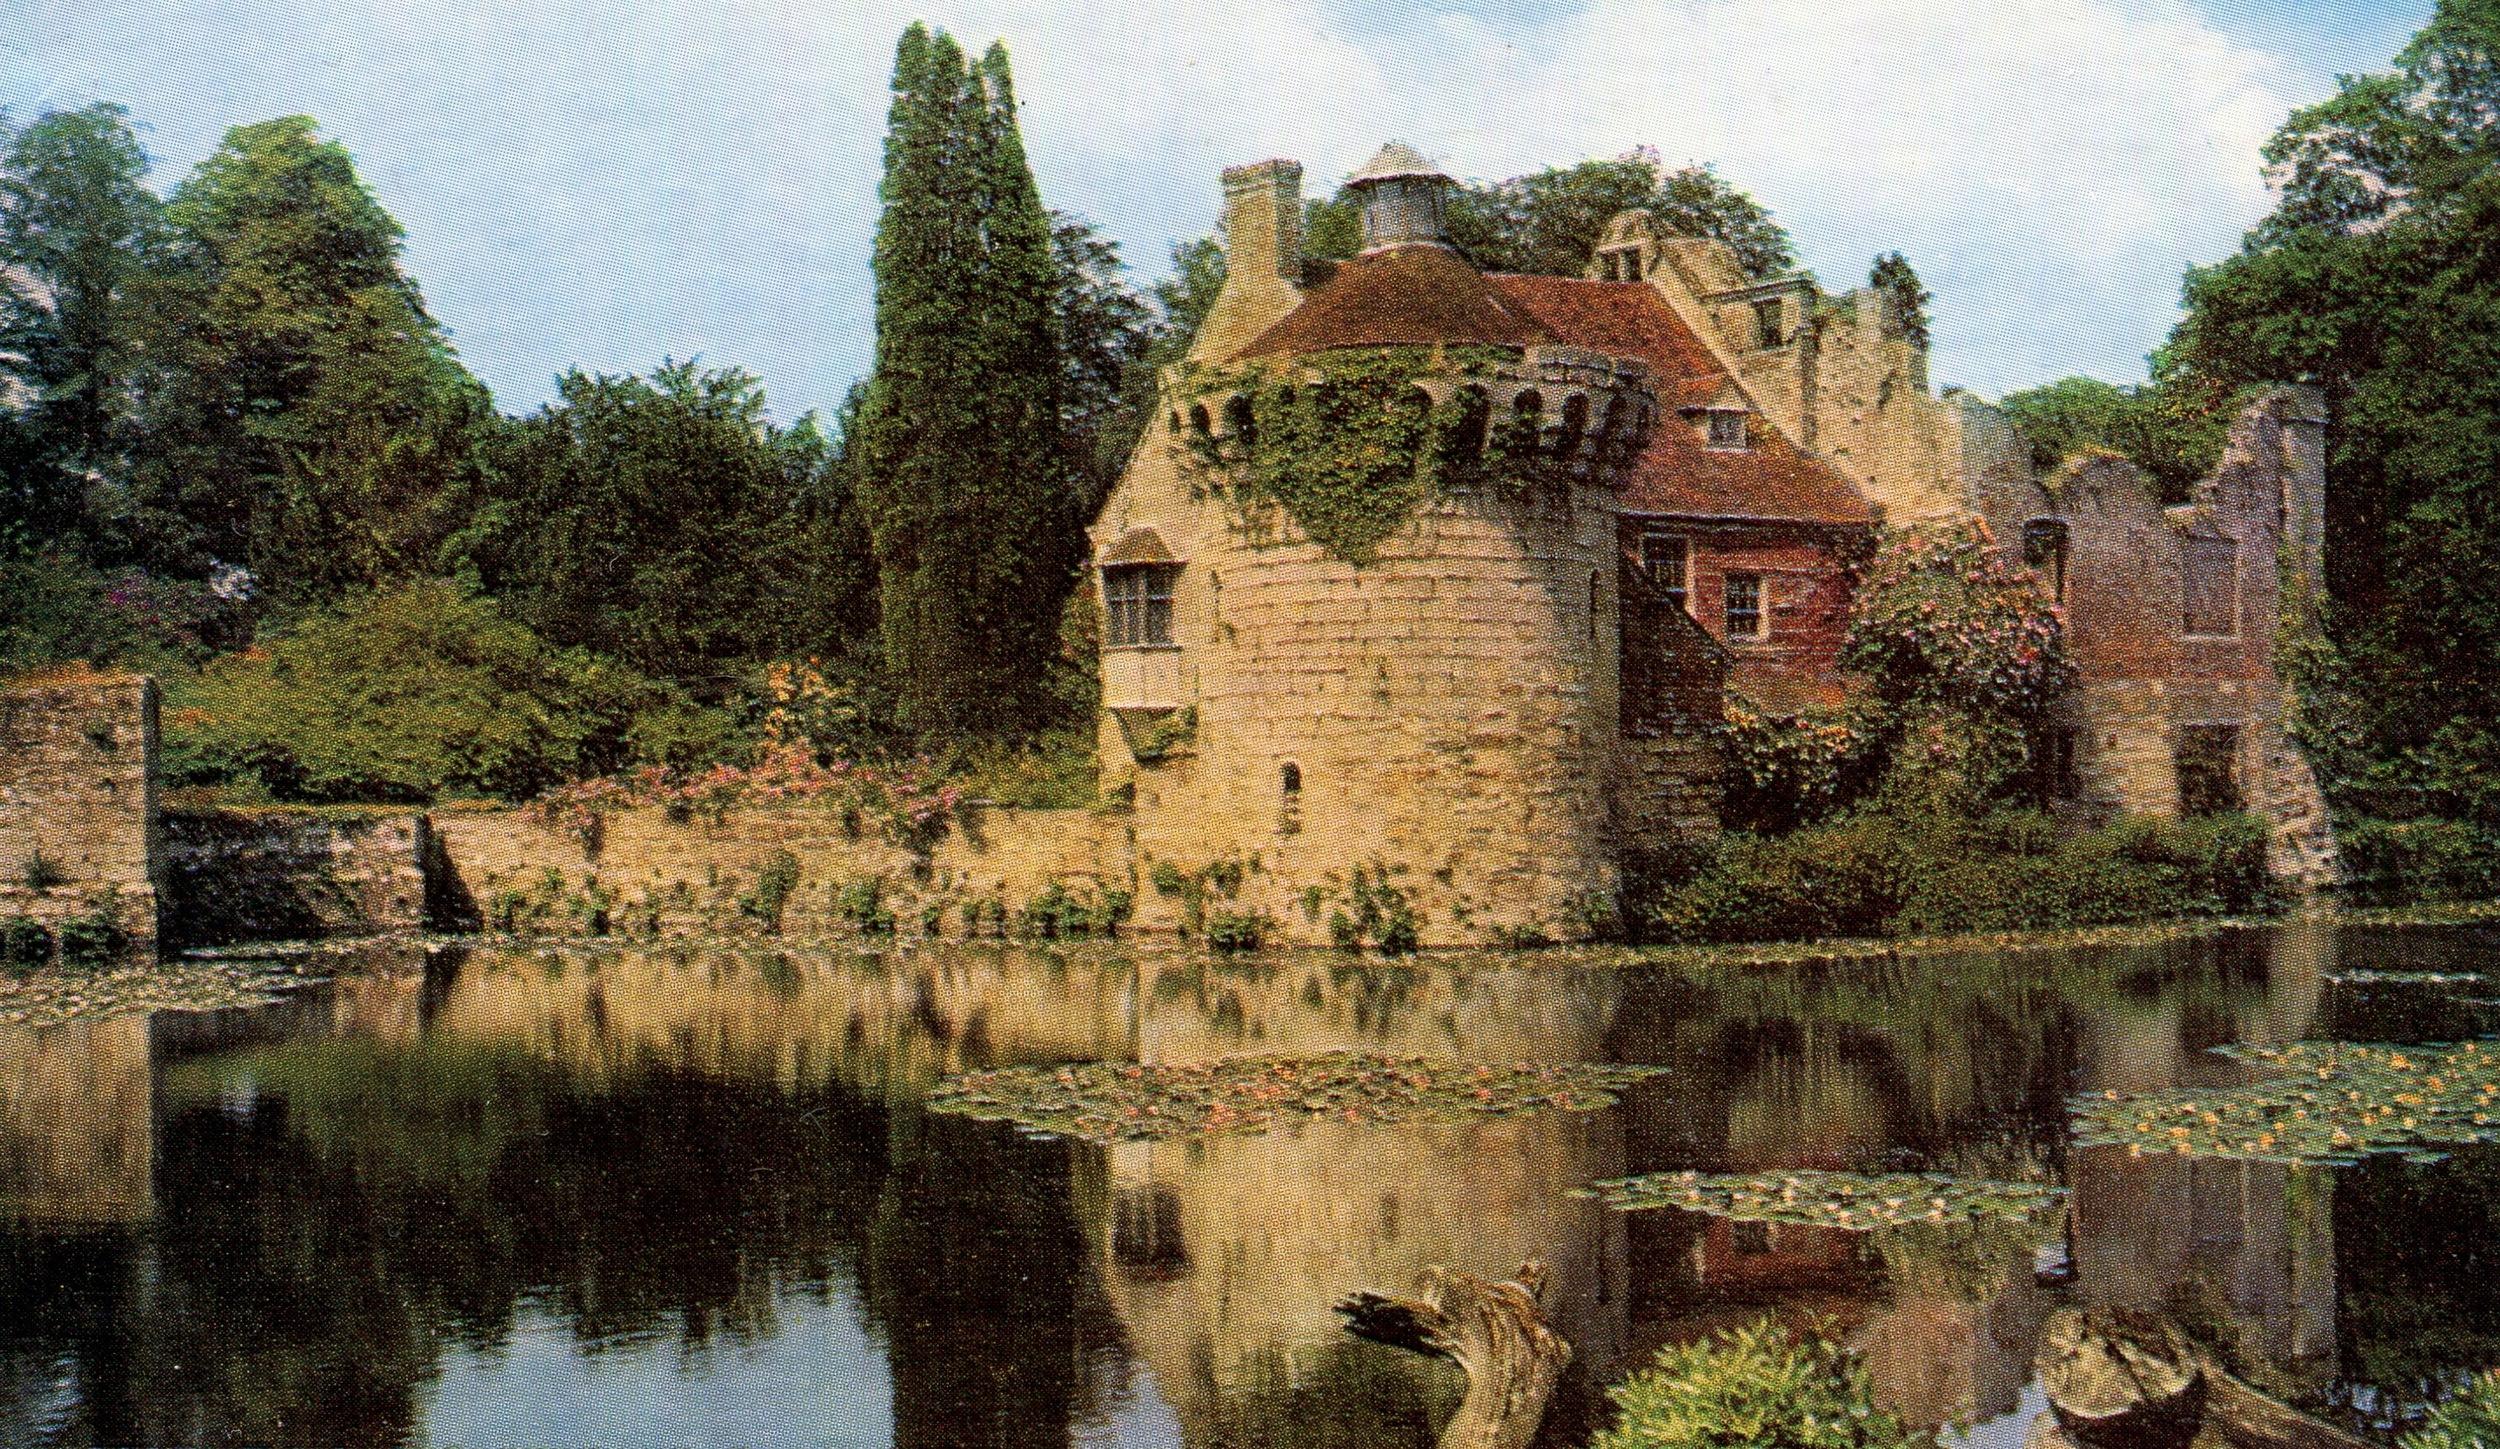 Scotney Old Castle, England